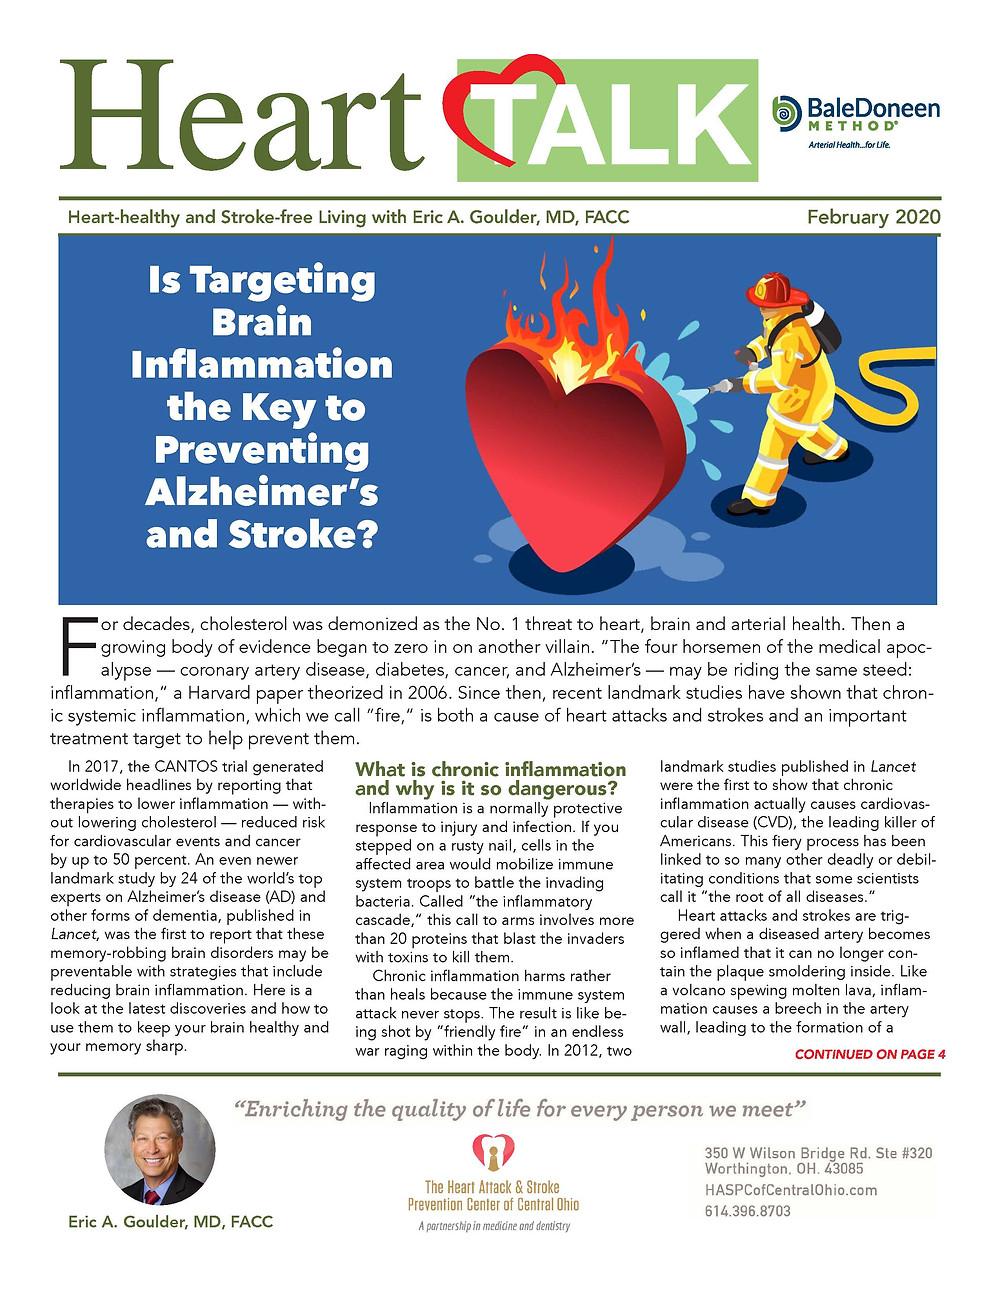 November 2020 Newsletter for the Heart Attack and Stroke Prevention Center of Central Ohio